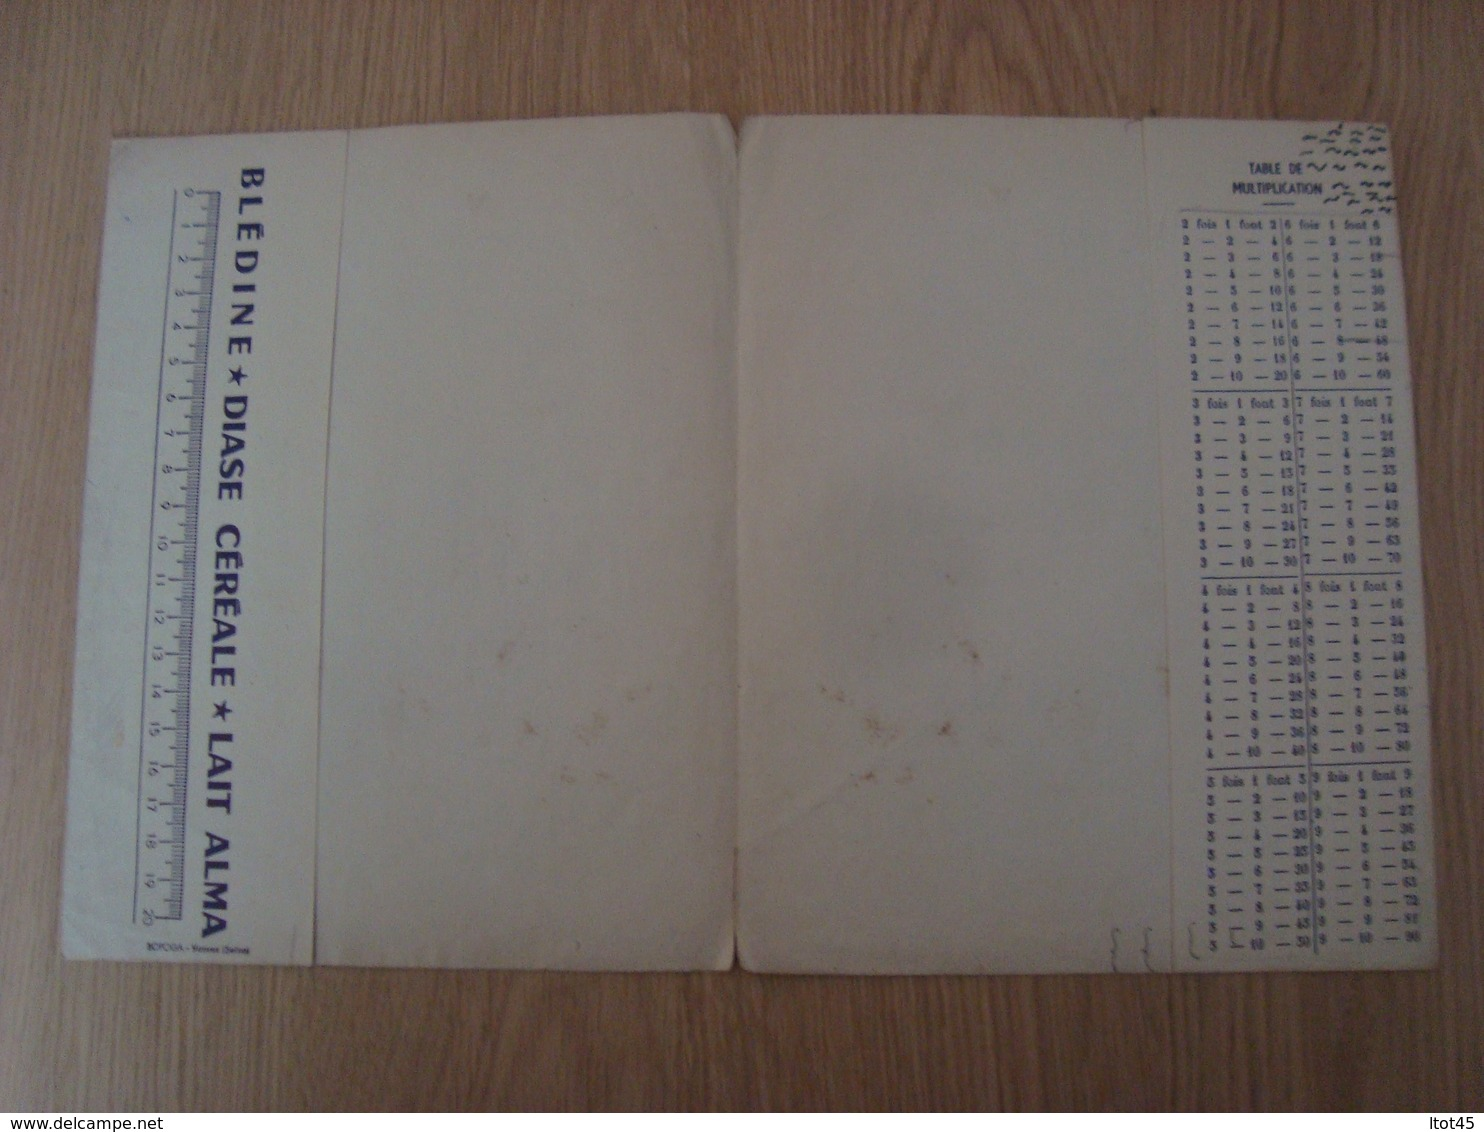 PROTEGE-CAHIER BLEDINE VILLEFRANCHE - Protège-cahiers